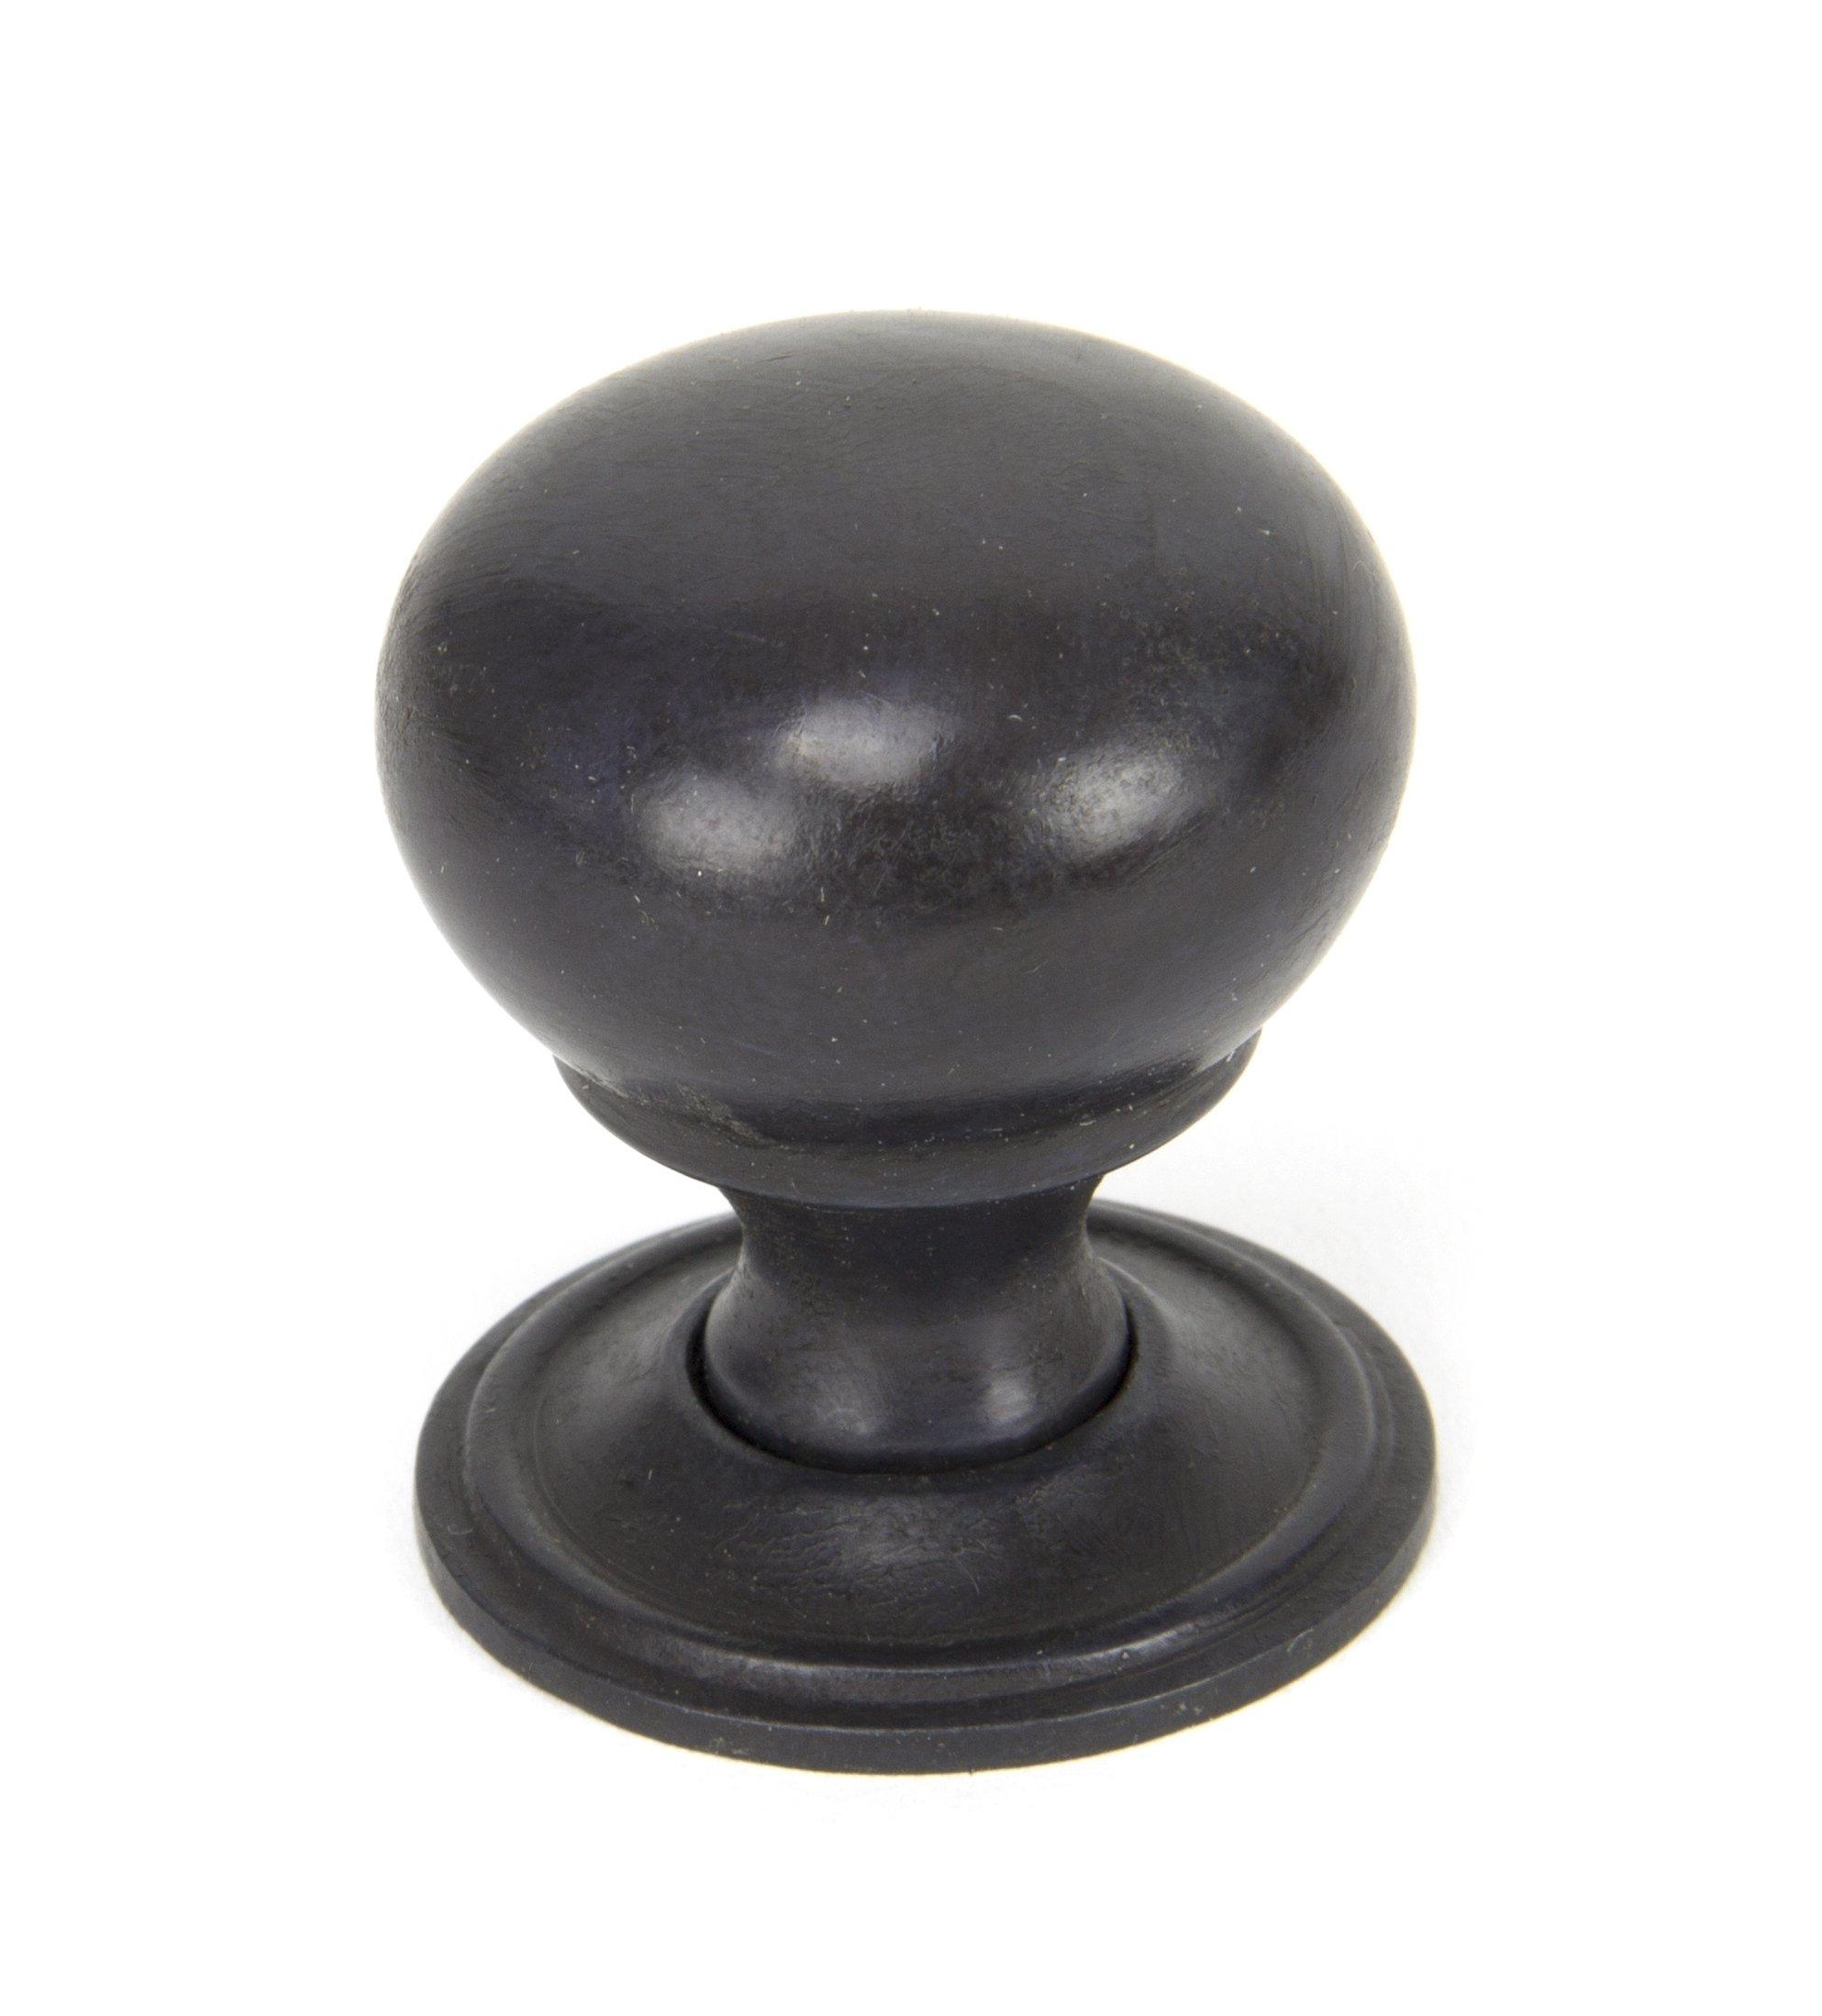 Aged Bronze Mushroom Cabinet Knob - Small image